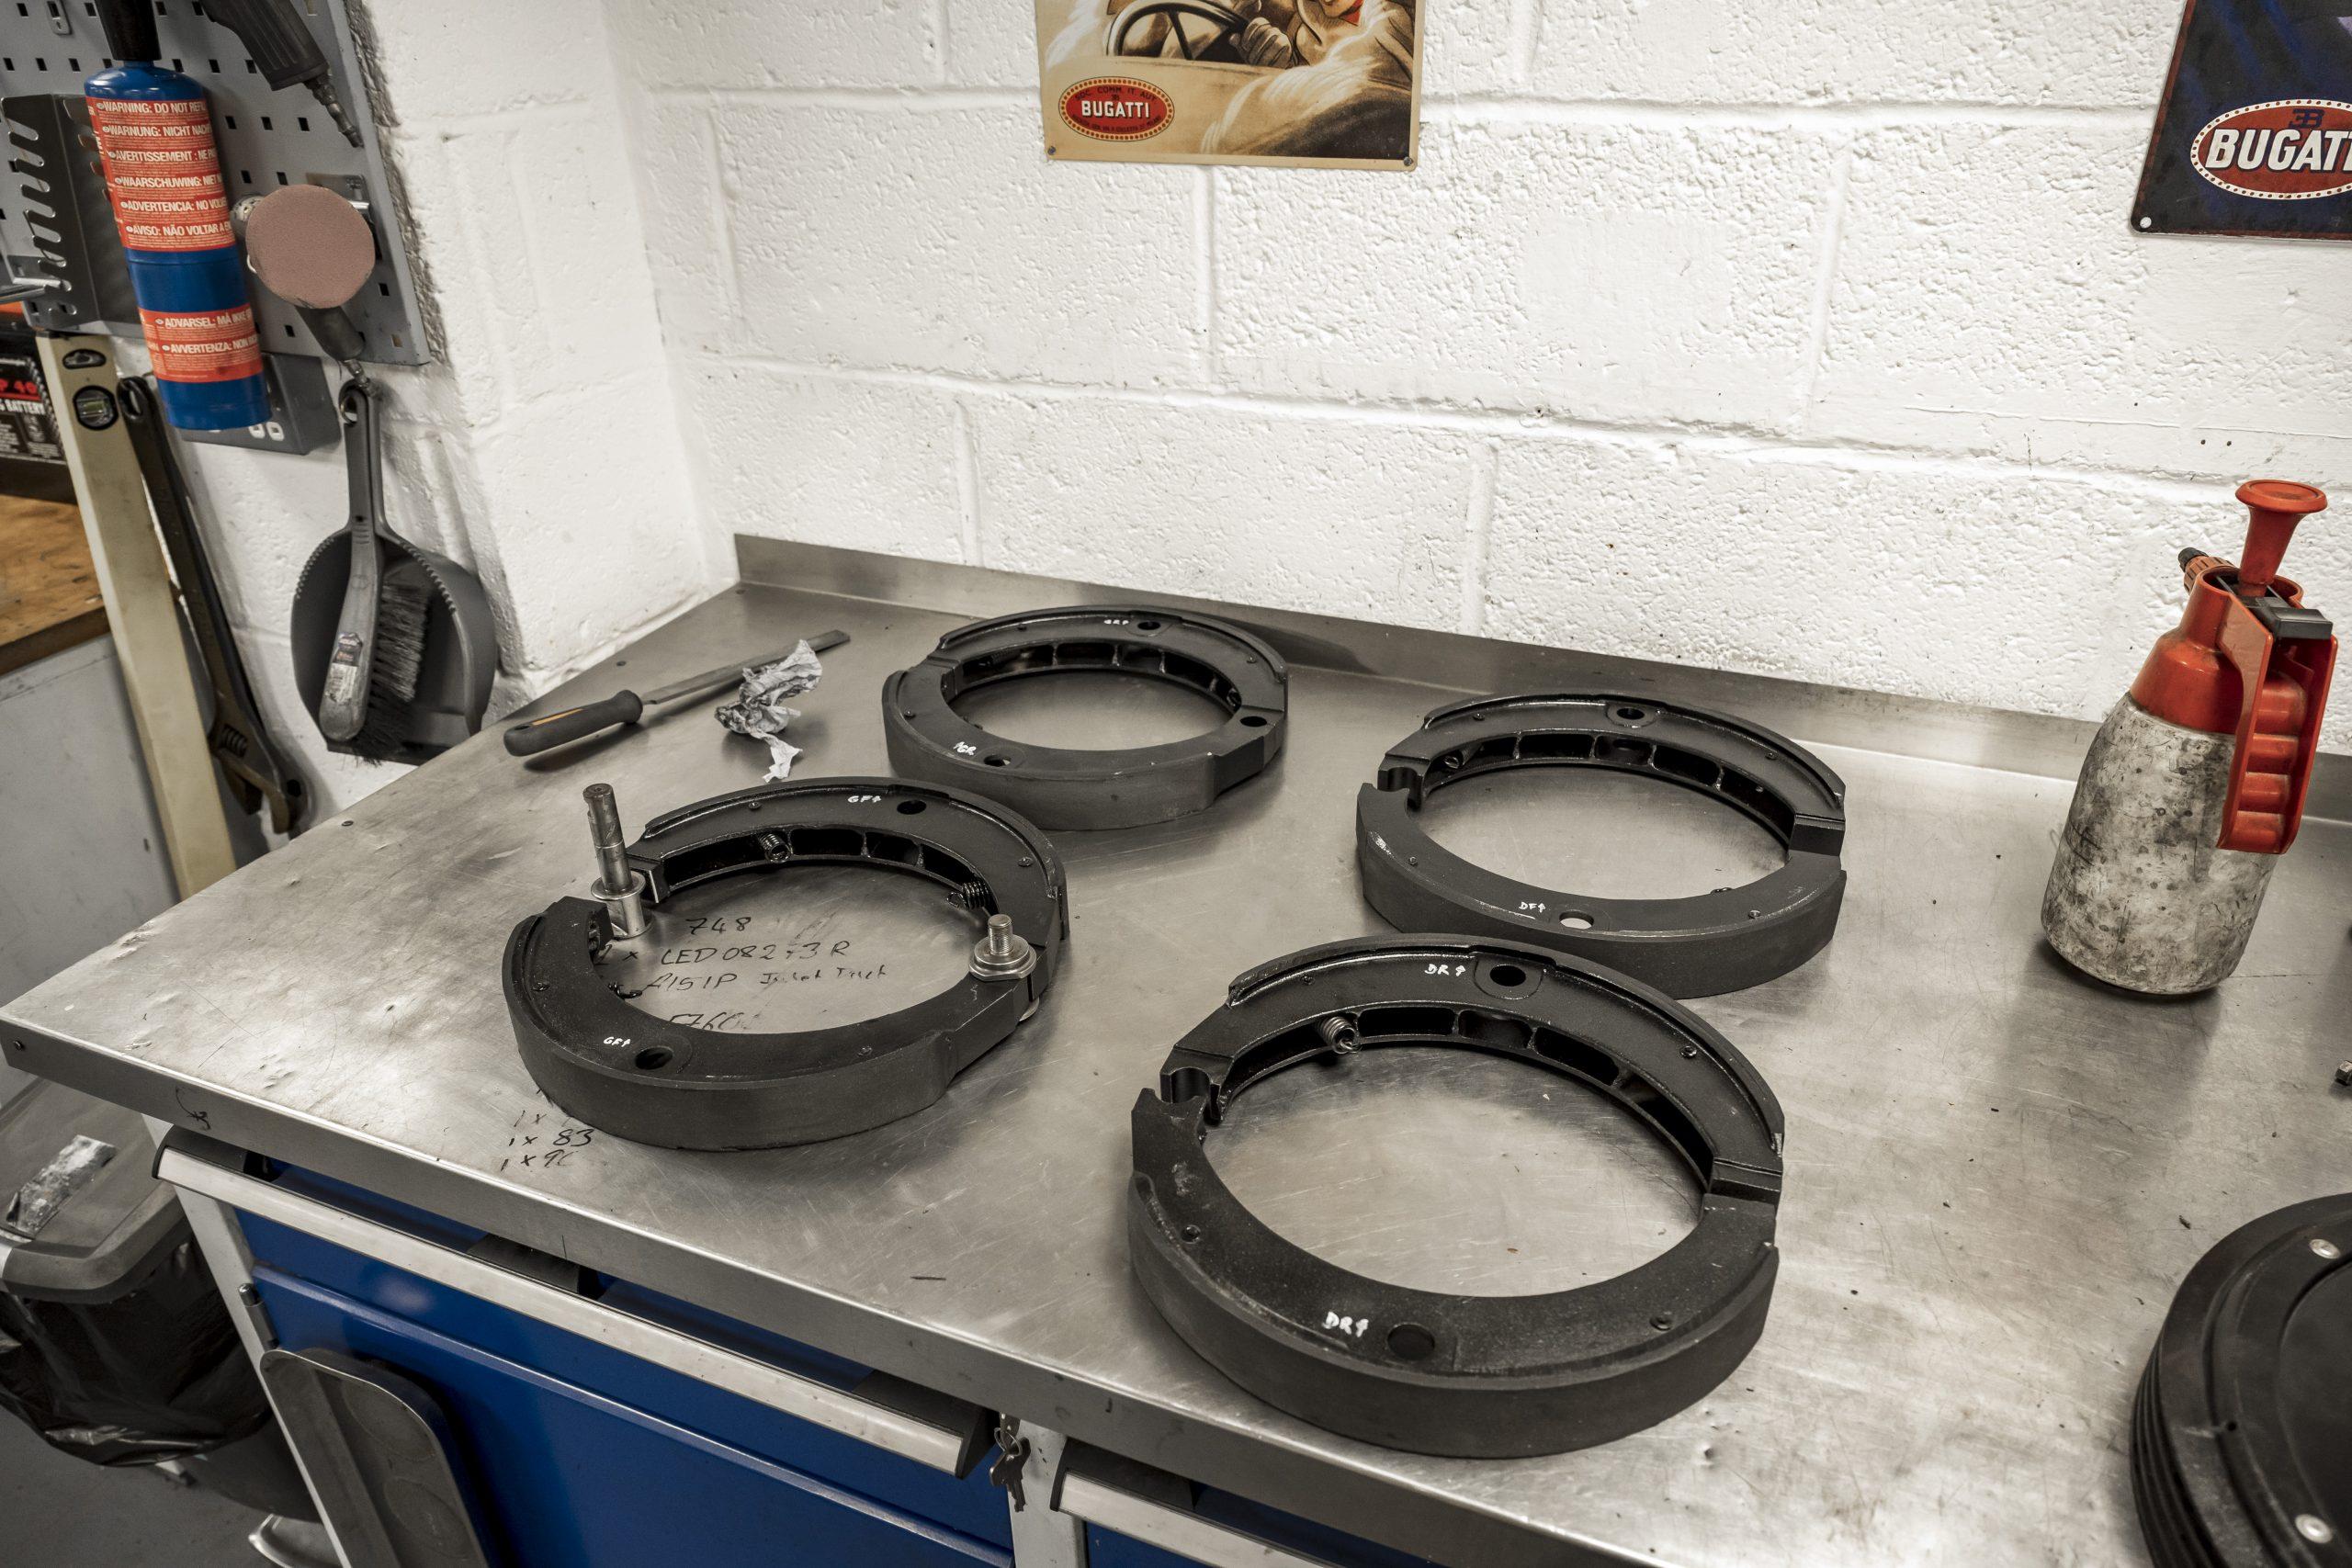 Tula Precision brake shoes on table